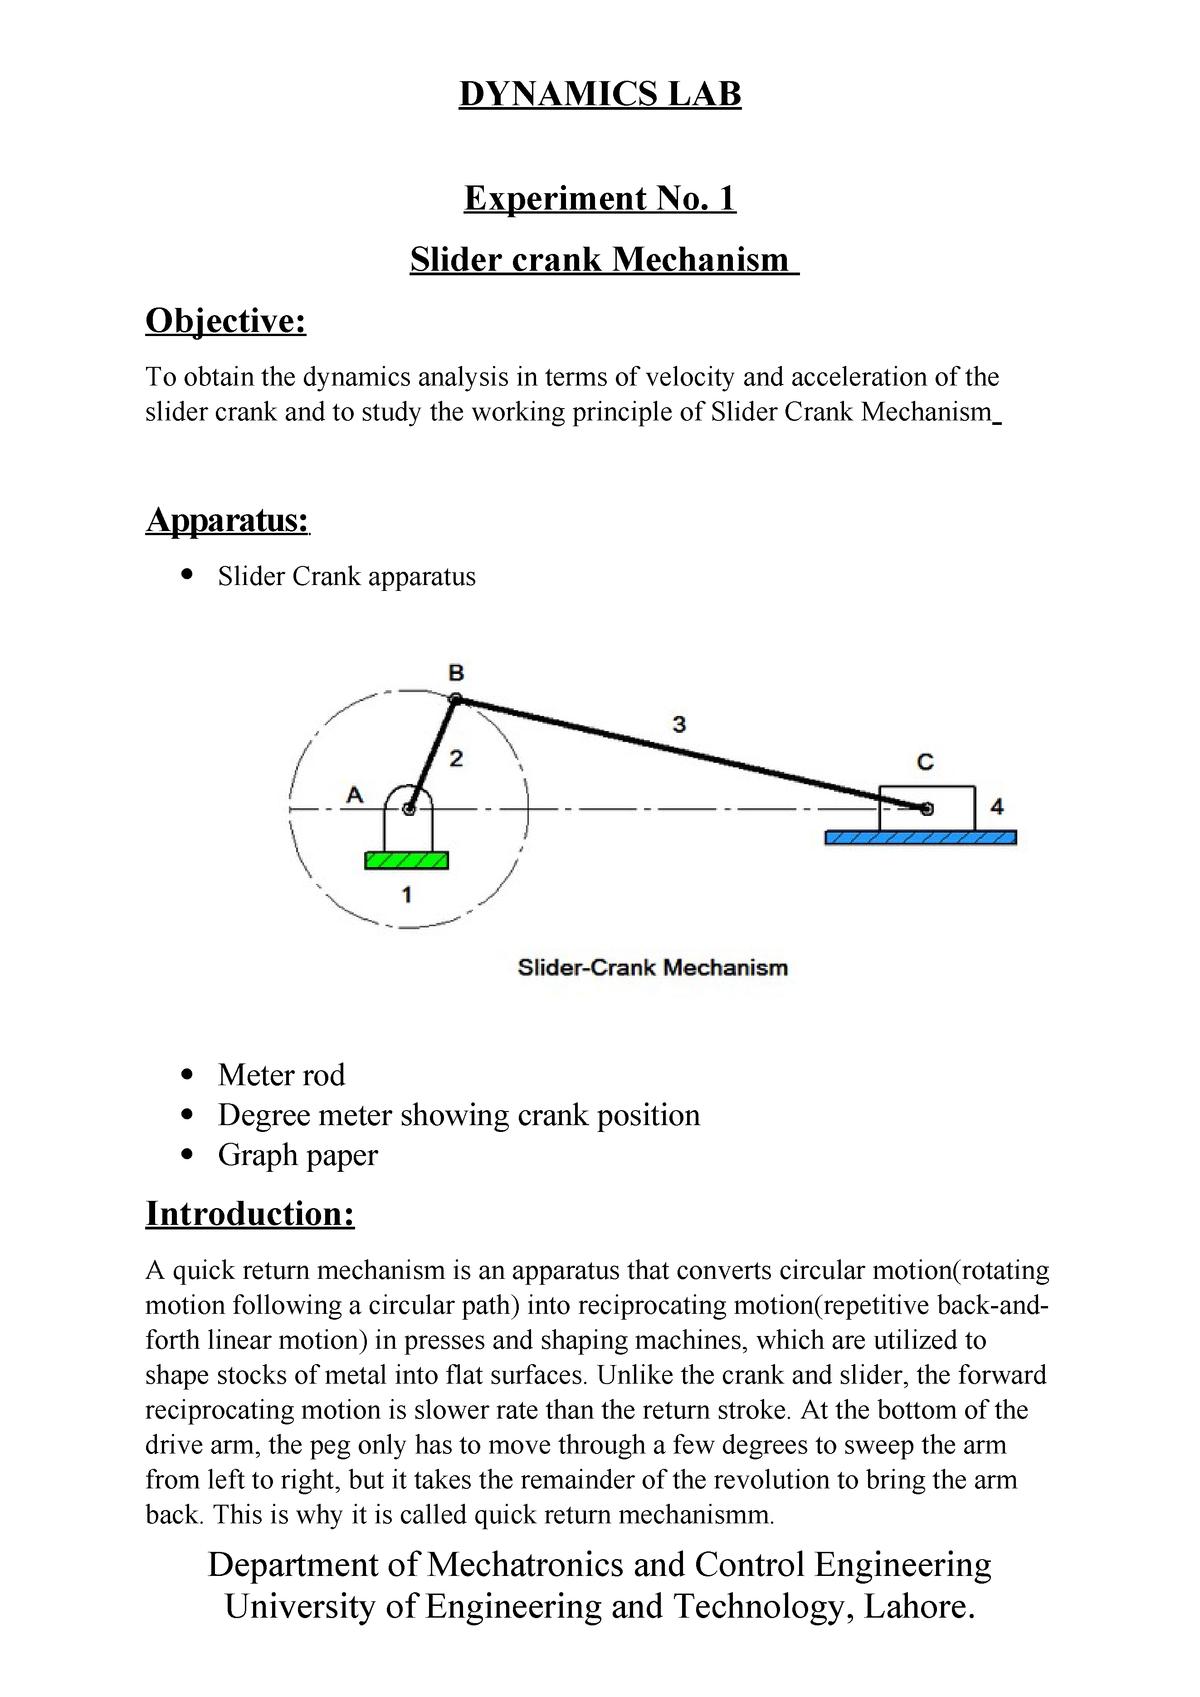 Slider crank - dynamics lab experiments - - UET Lahore - StuDocu